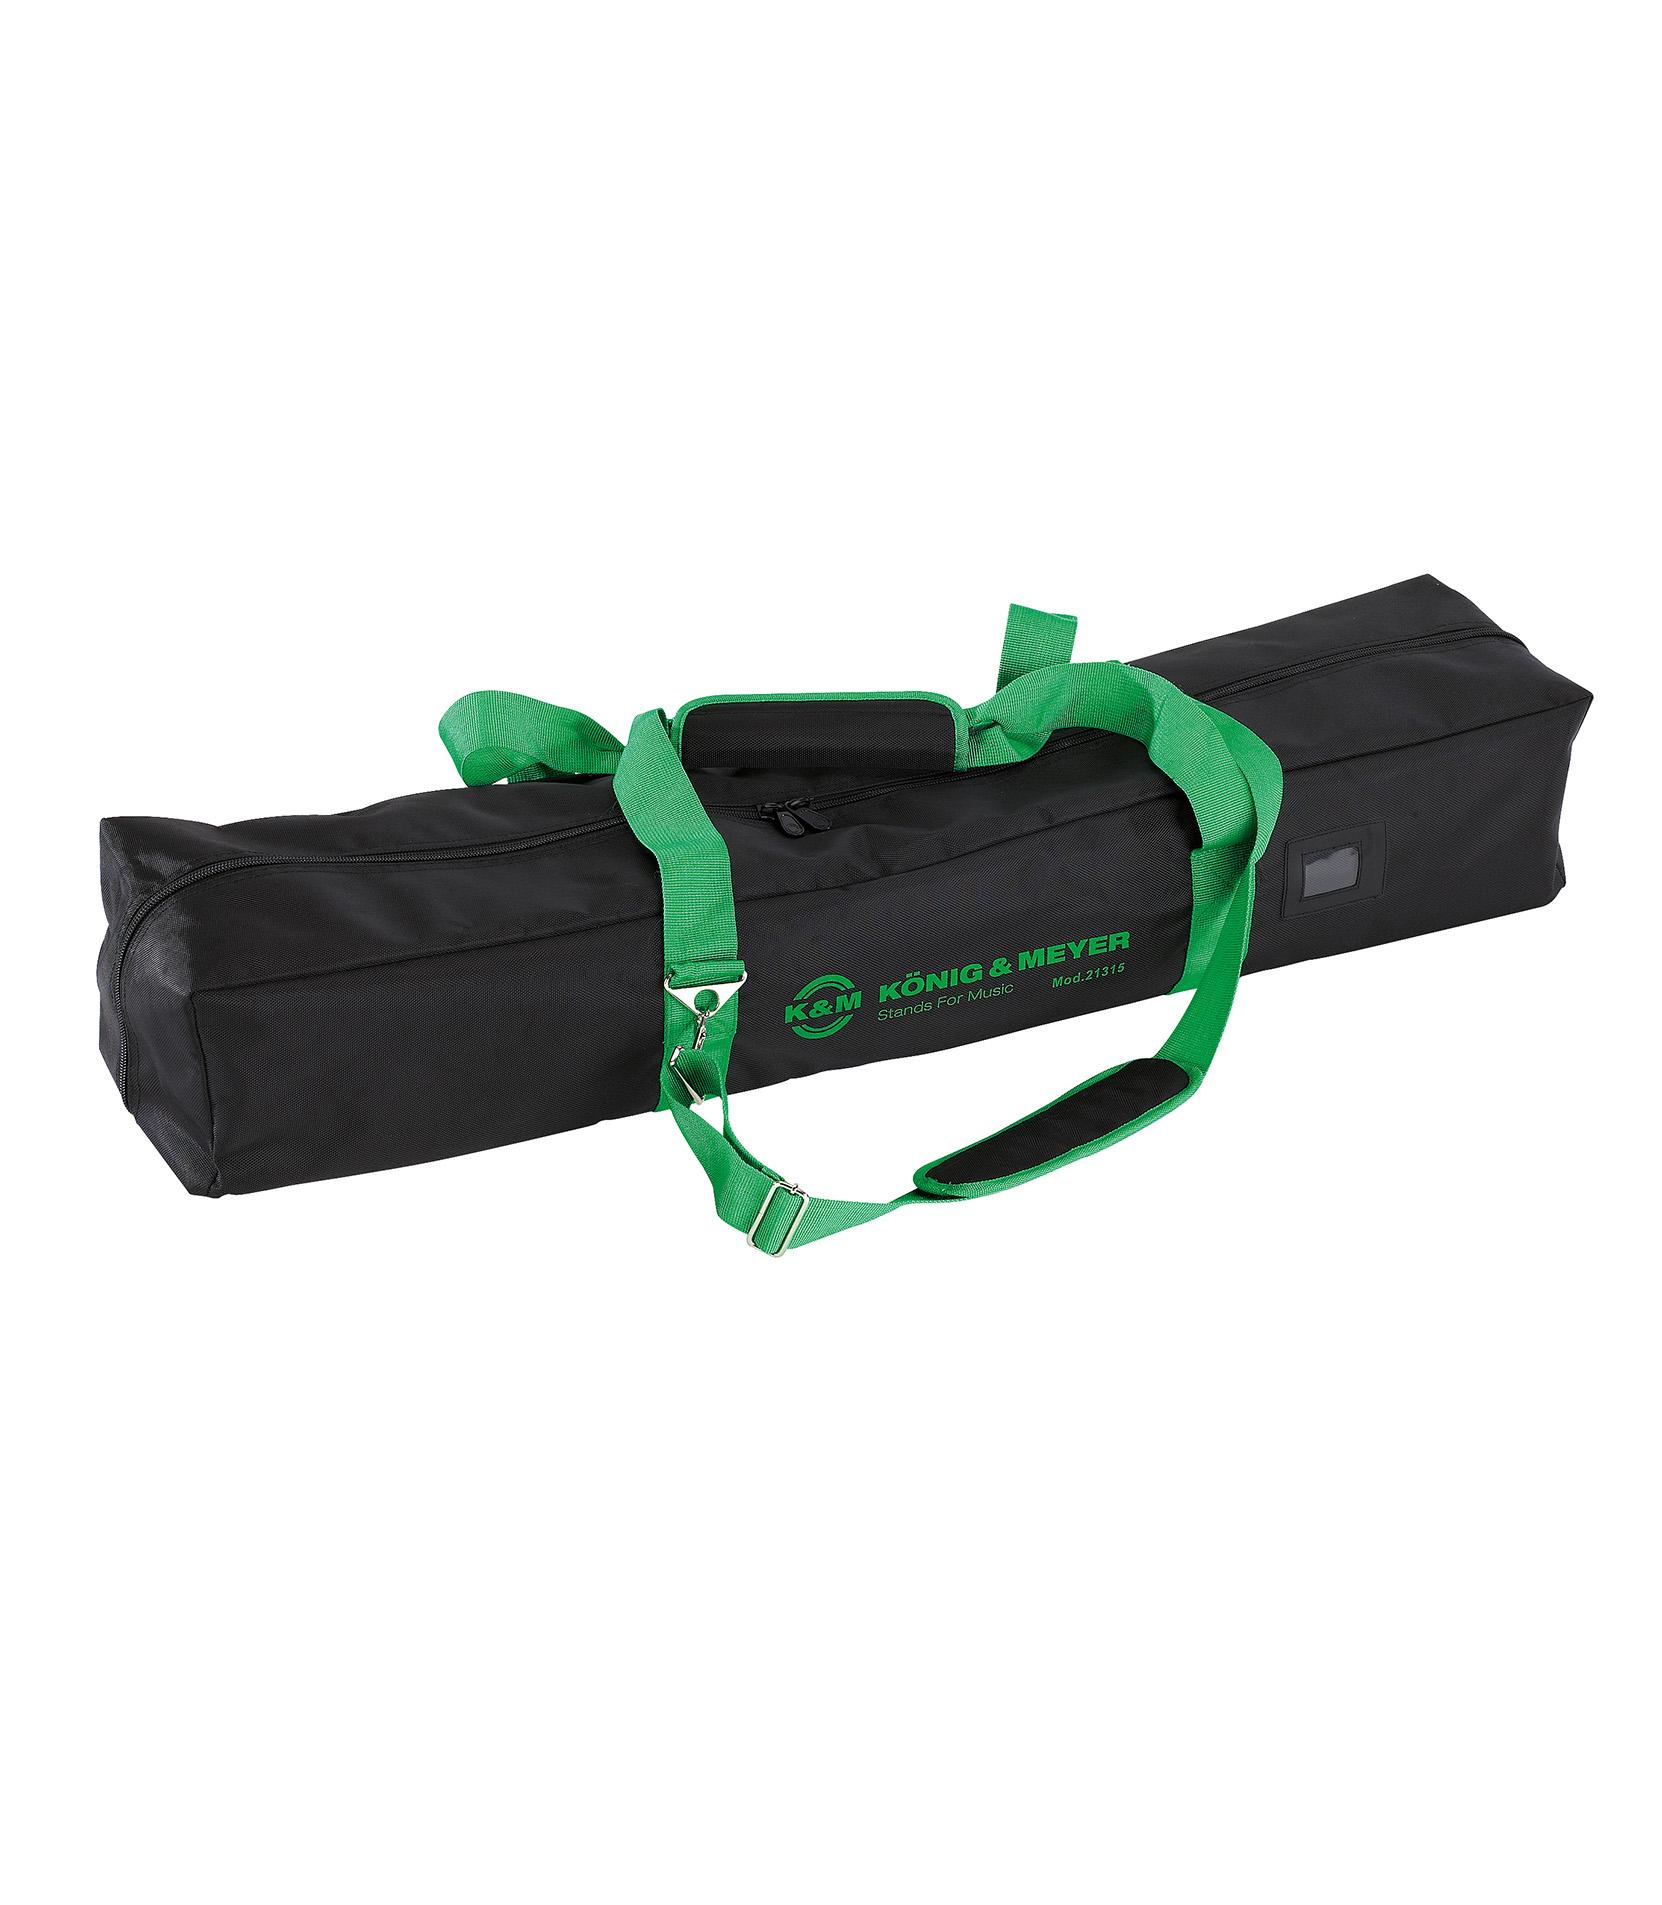 buy k&m 21315 000 00 carrying case